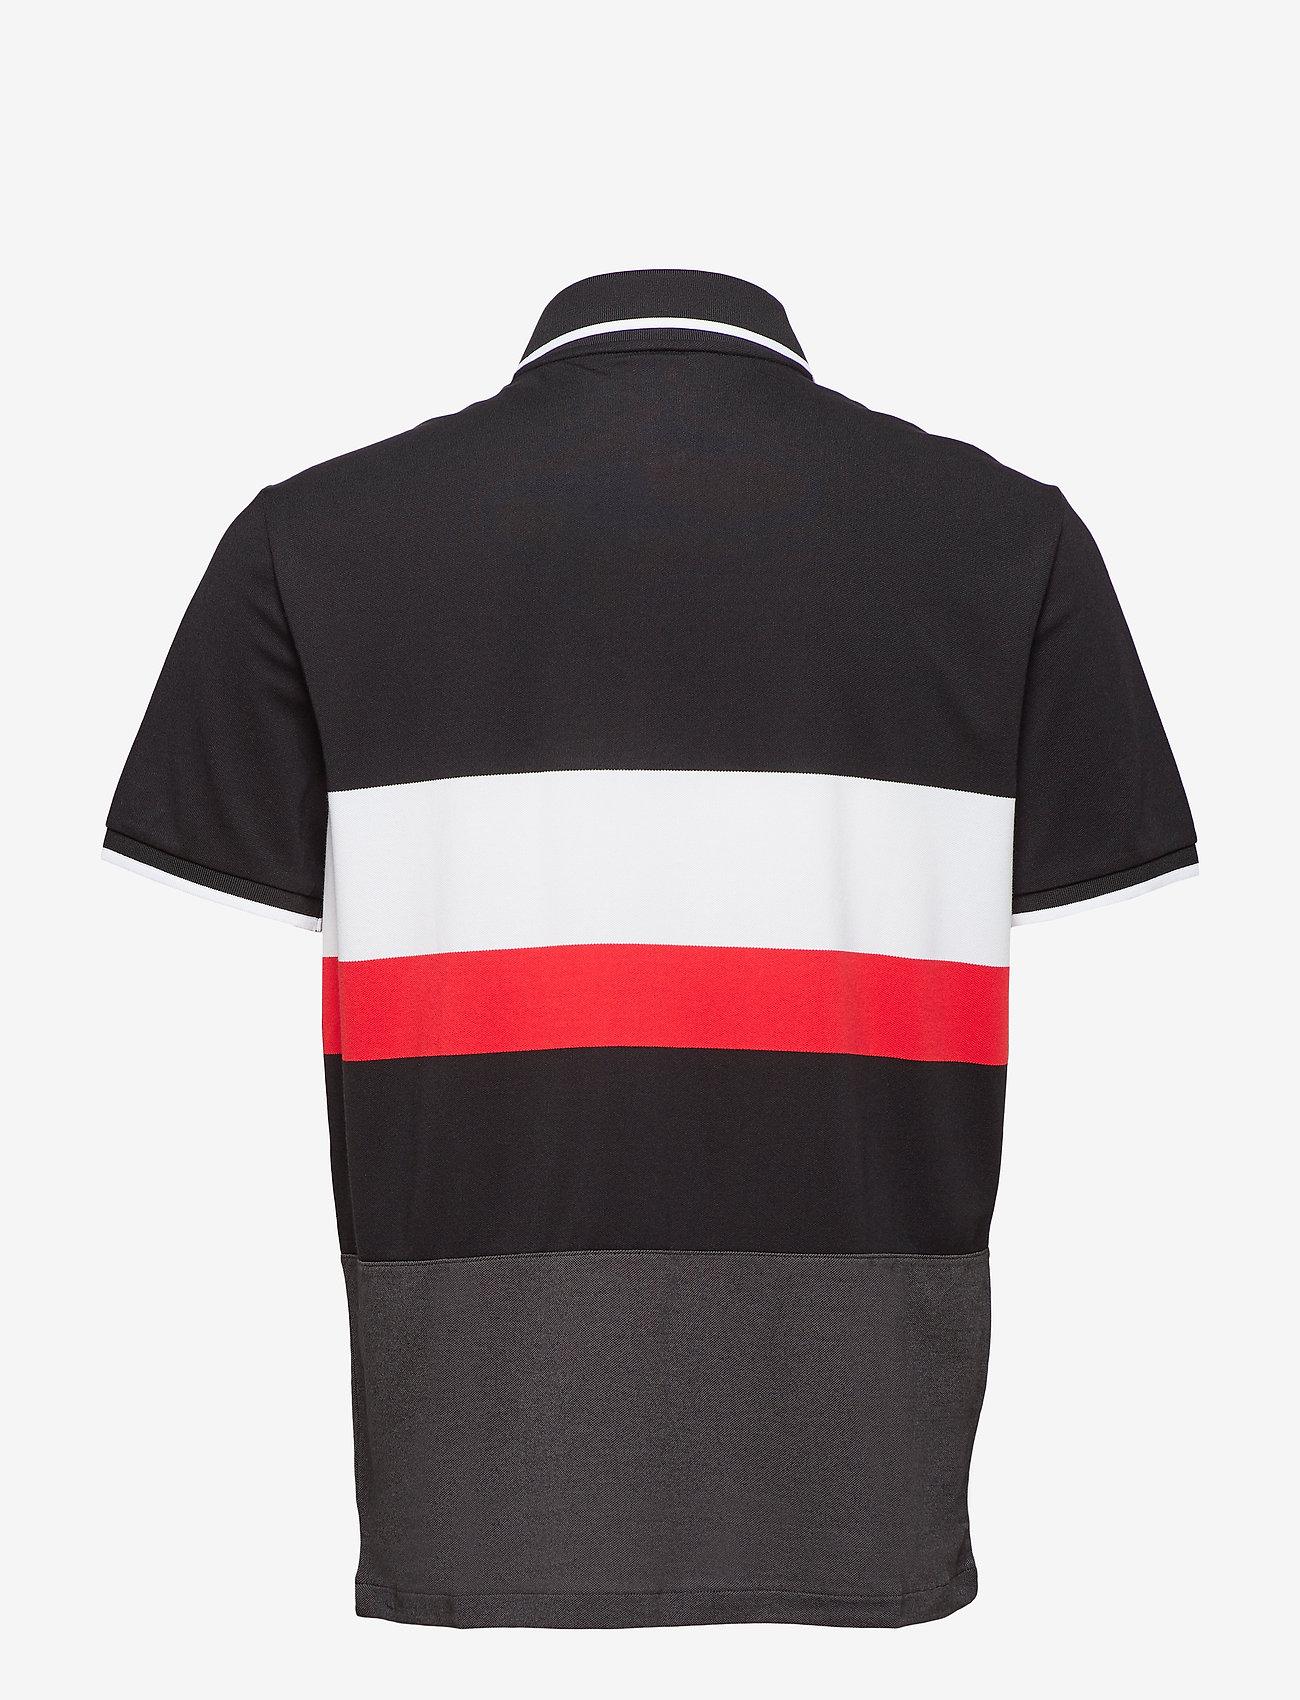 Ss Polo M2-short Sleeve-knit (Polo Black/windso) (718 kr) - Polo Ralph Lauren